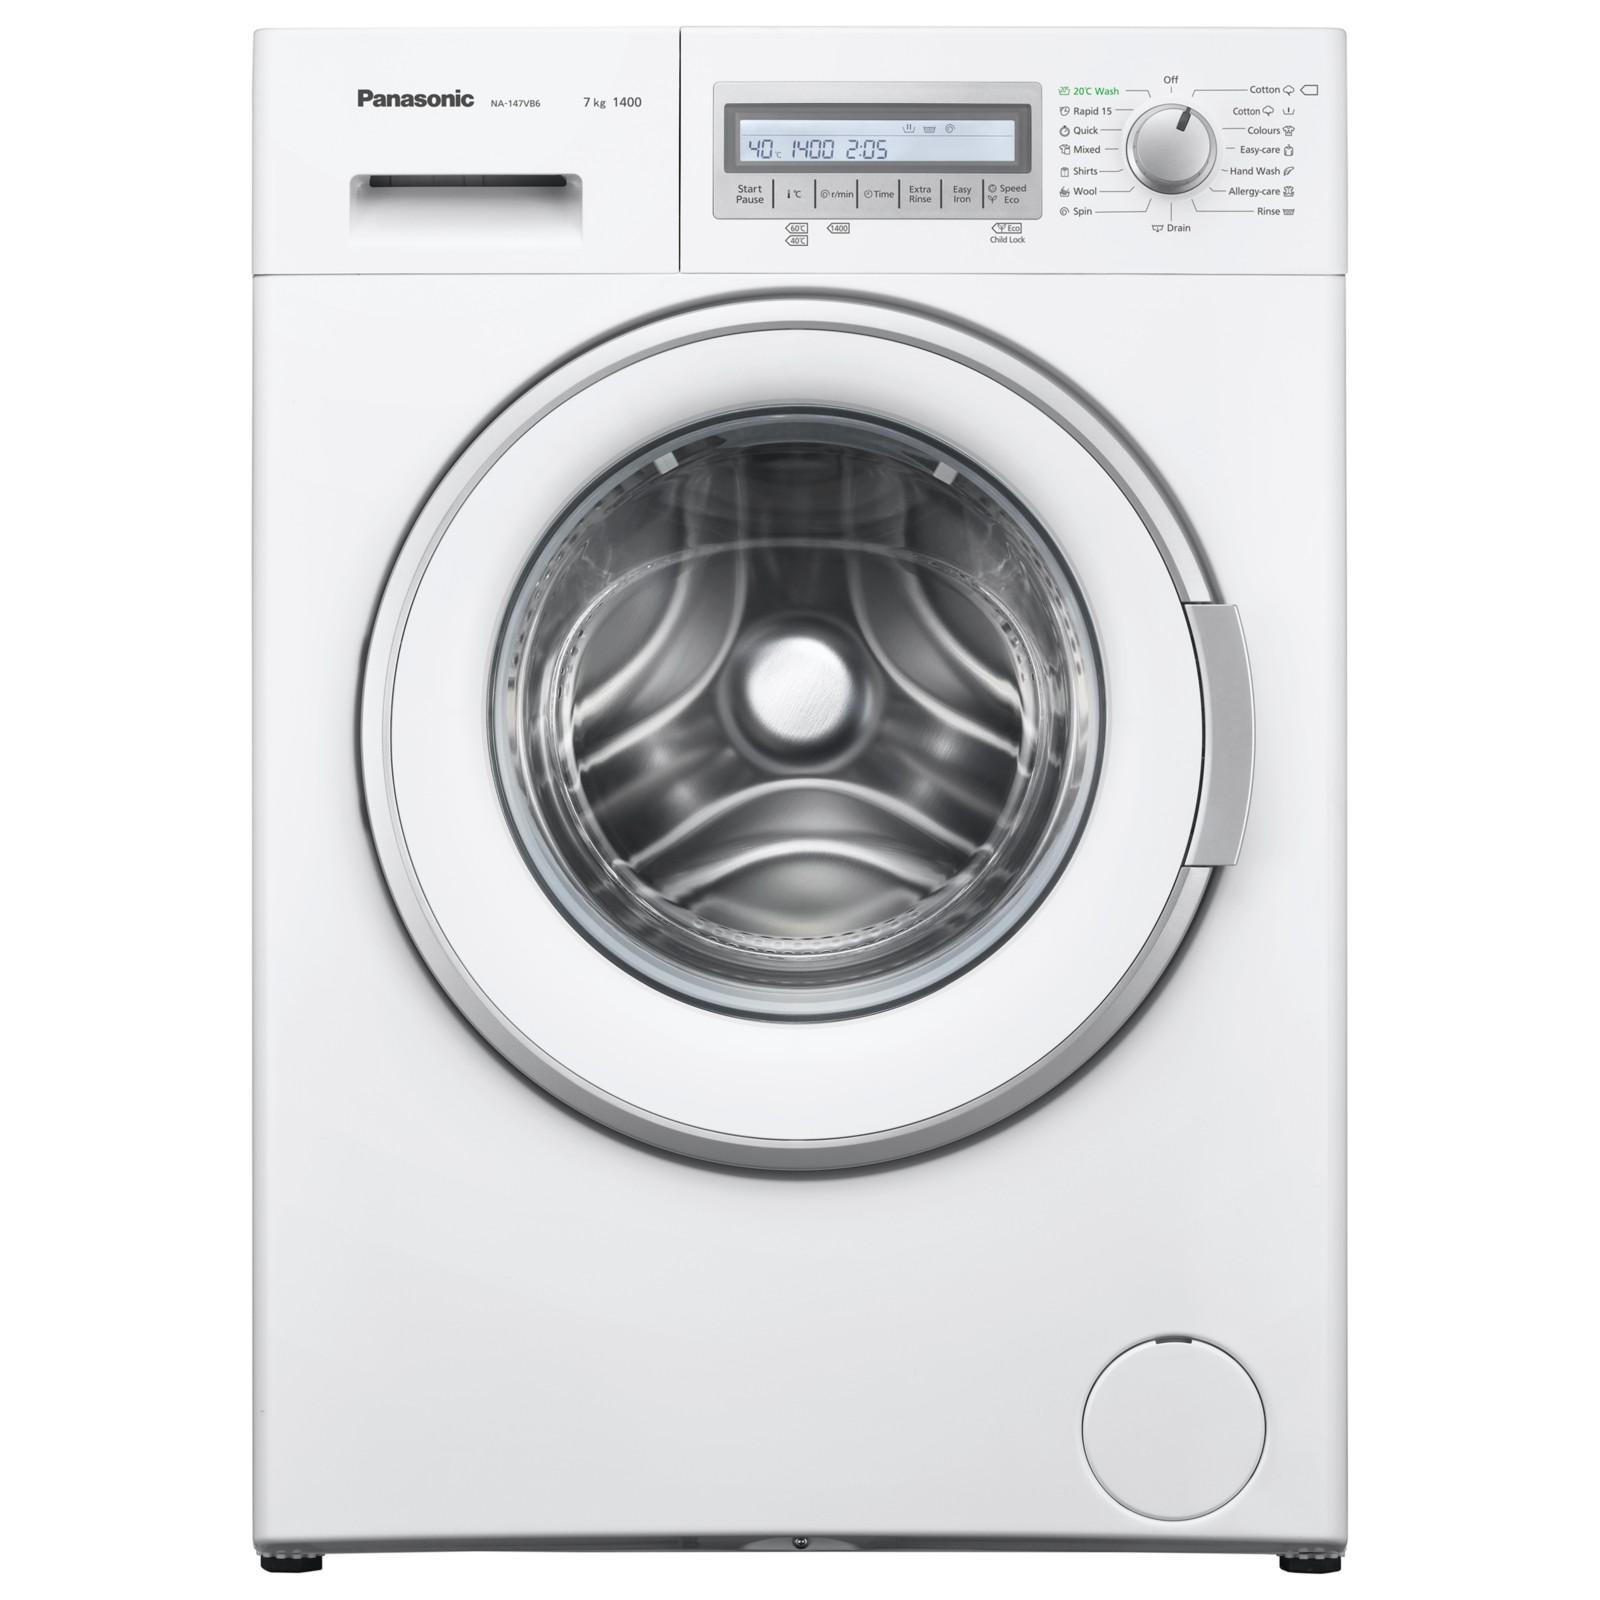 Panasonic NA-147VB6WGB Freestanding Washing Machine